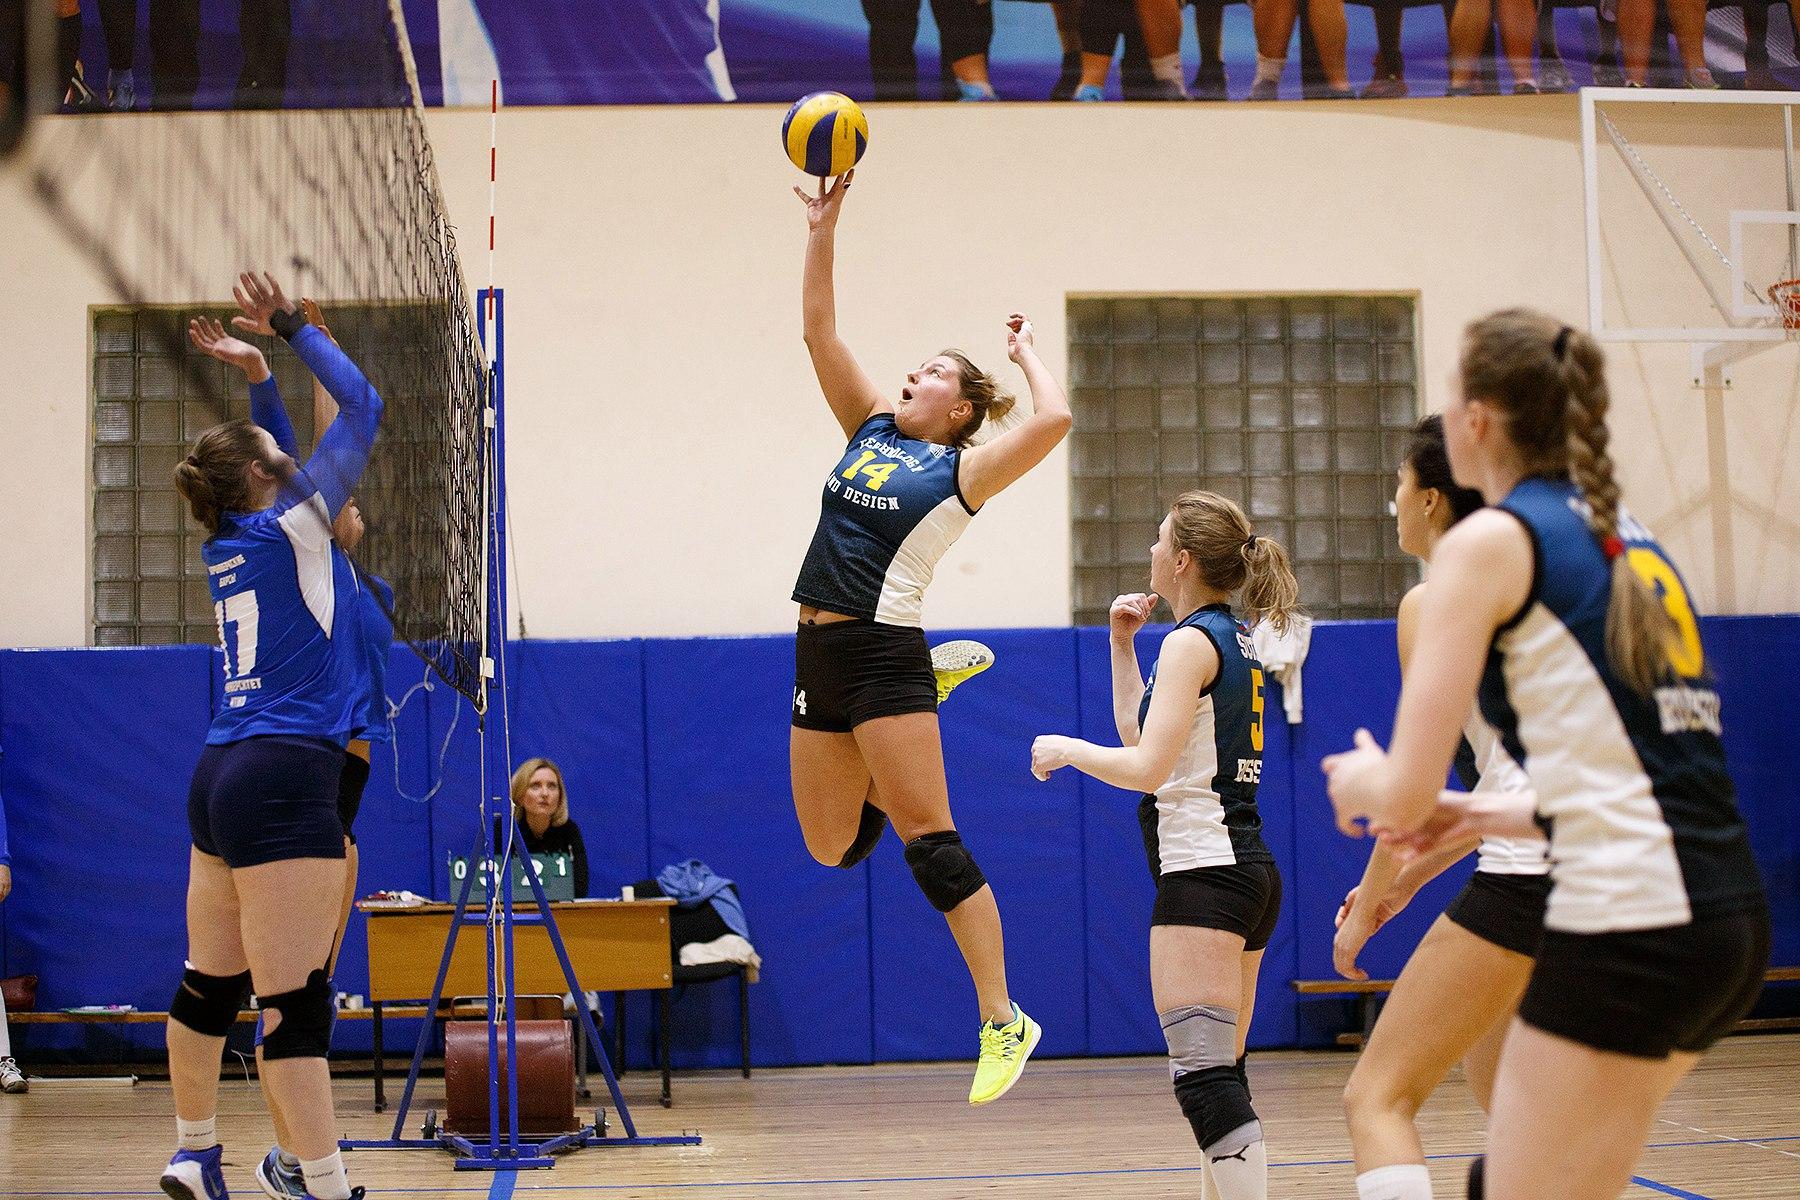 Volleyball direkt